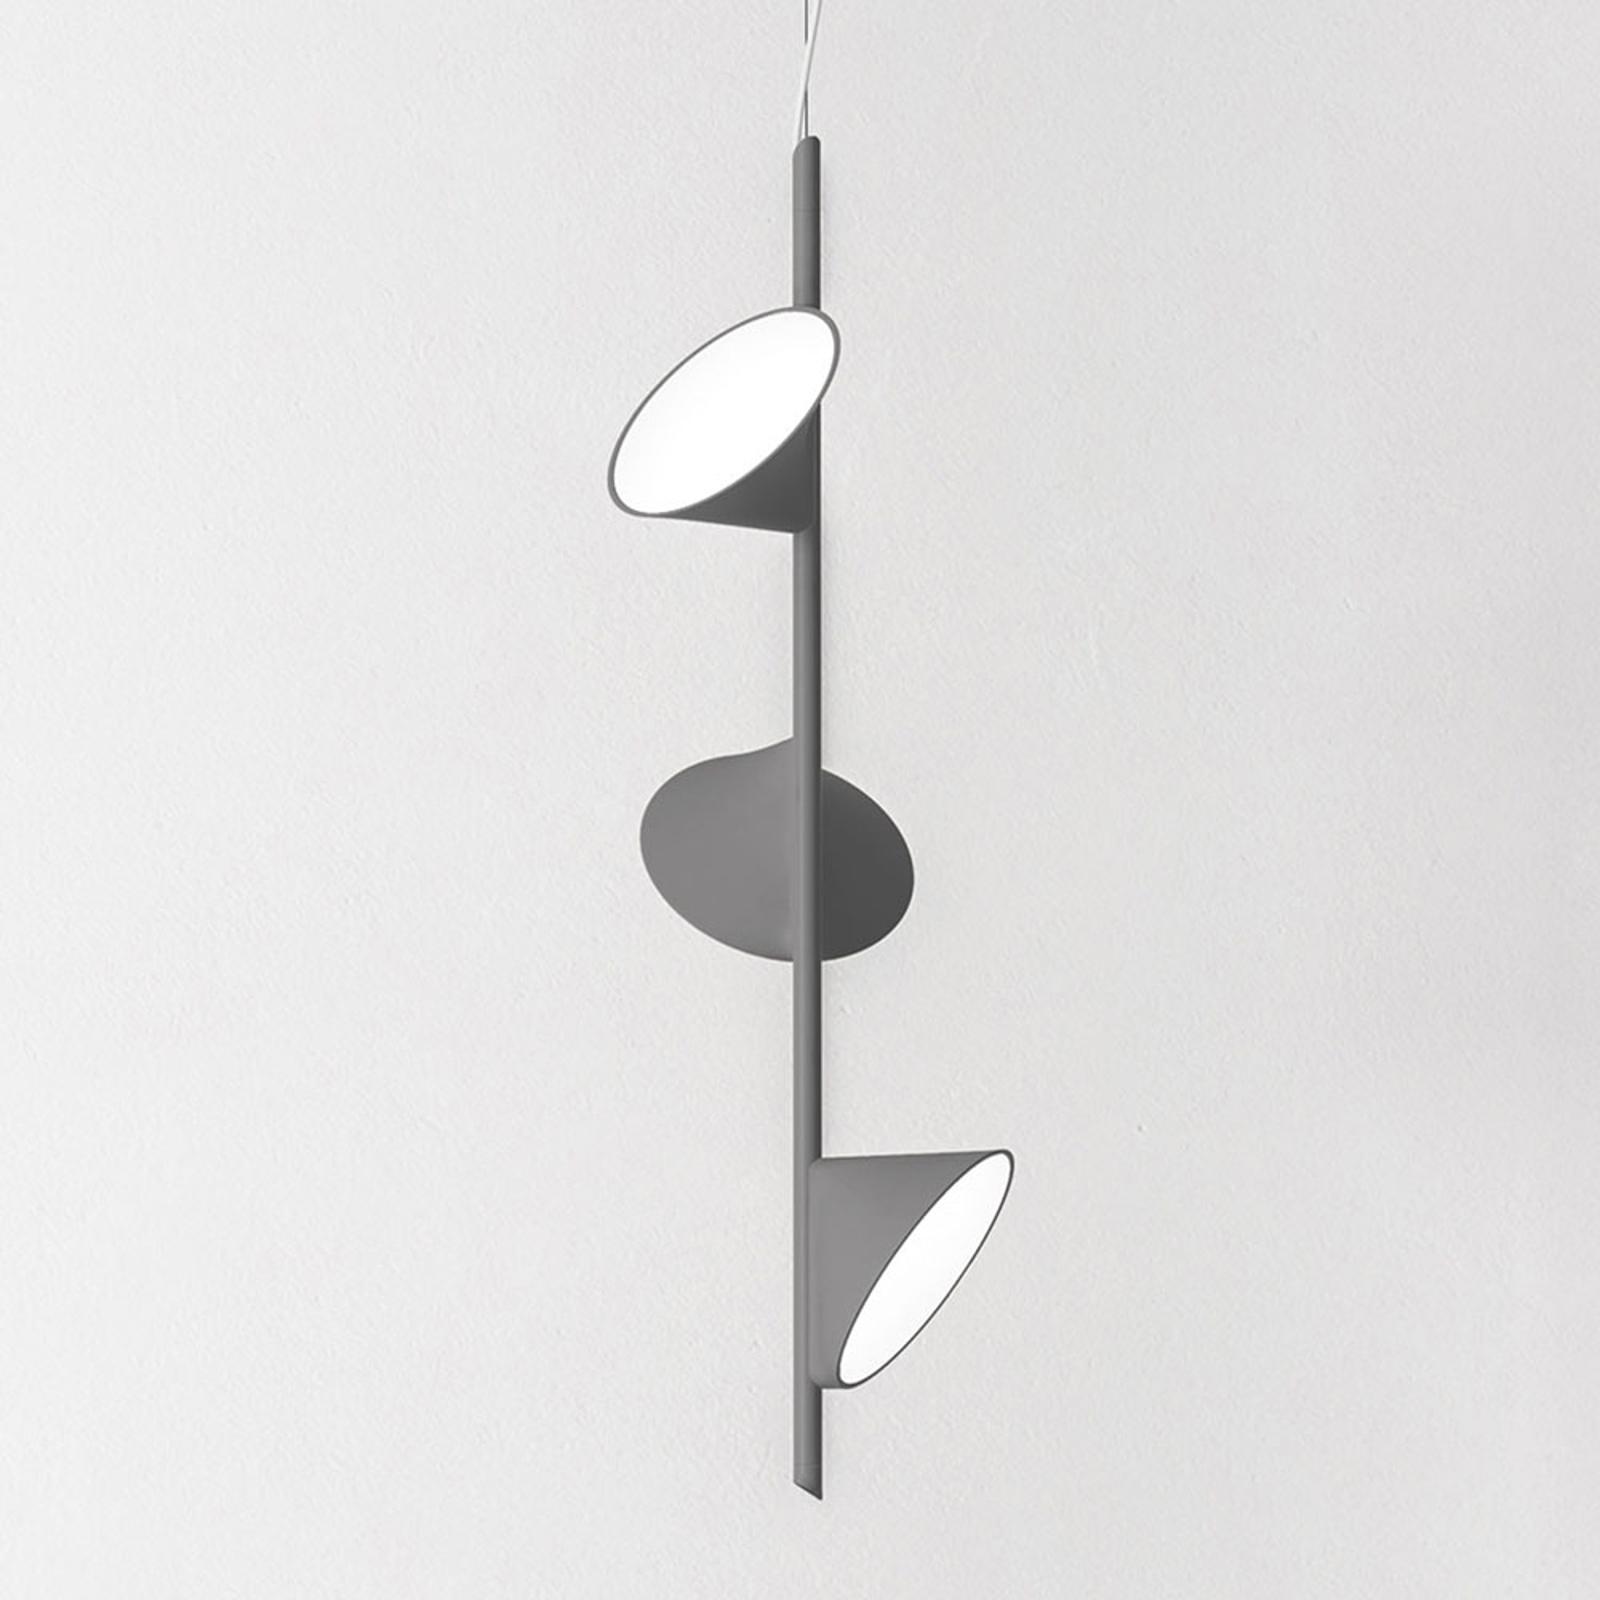 Axolight Orchid LED-Hängeleuchte, dreiflammig grau